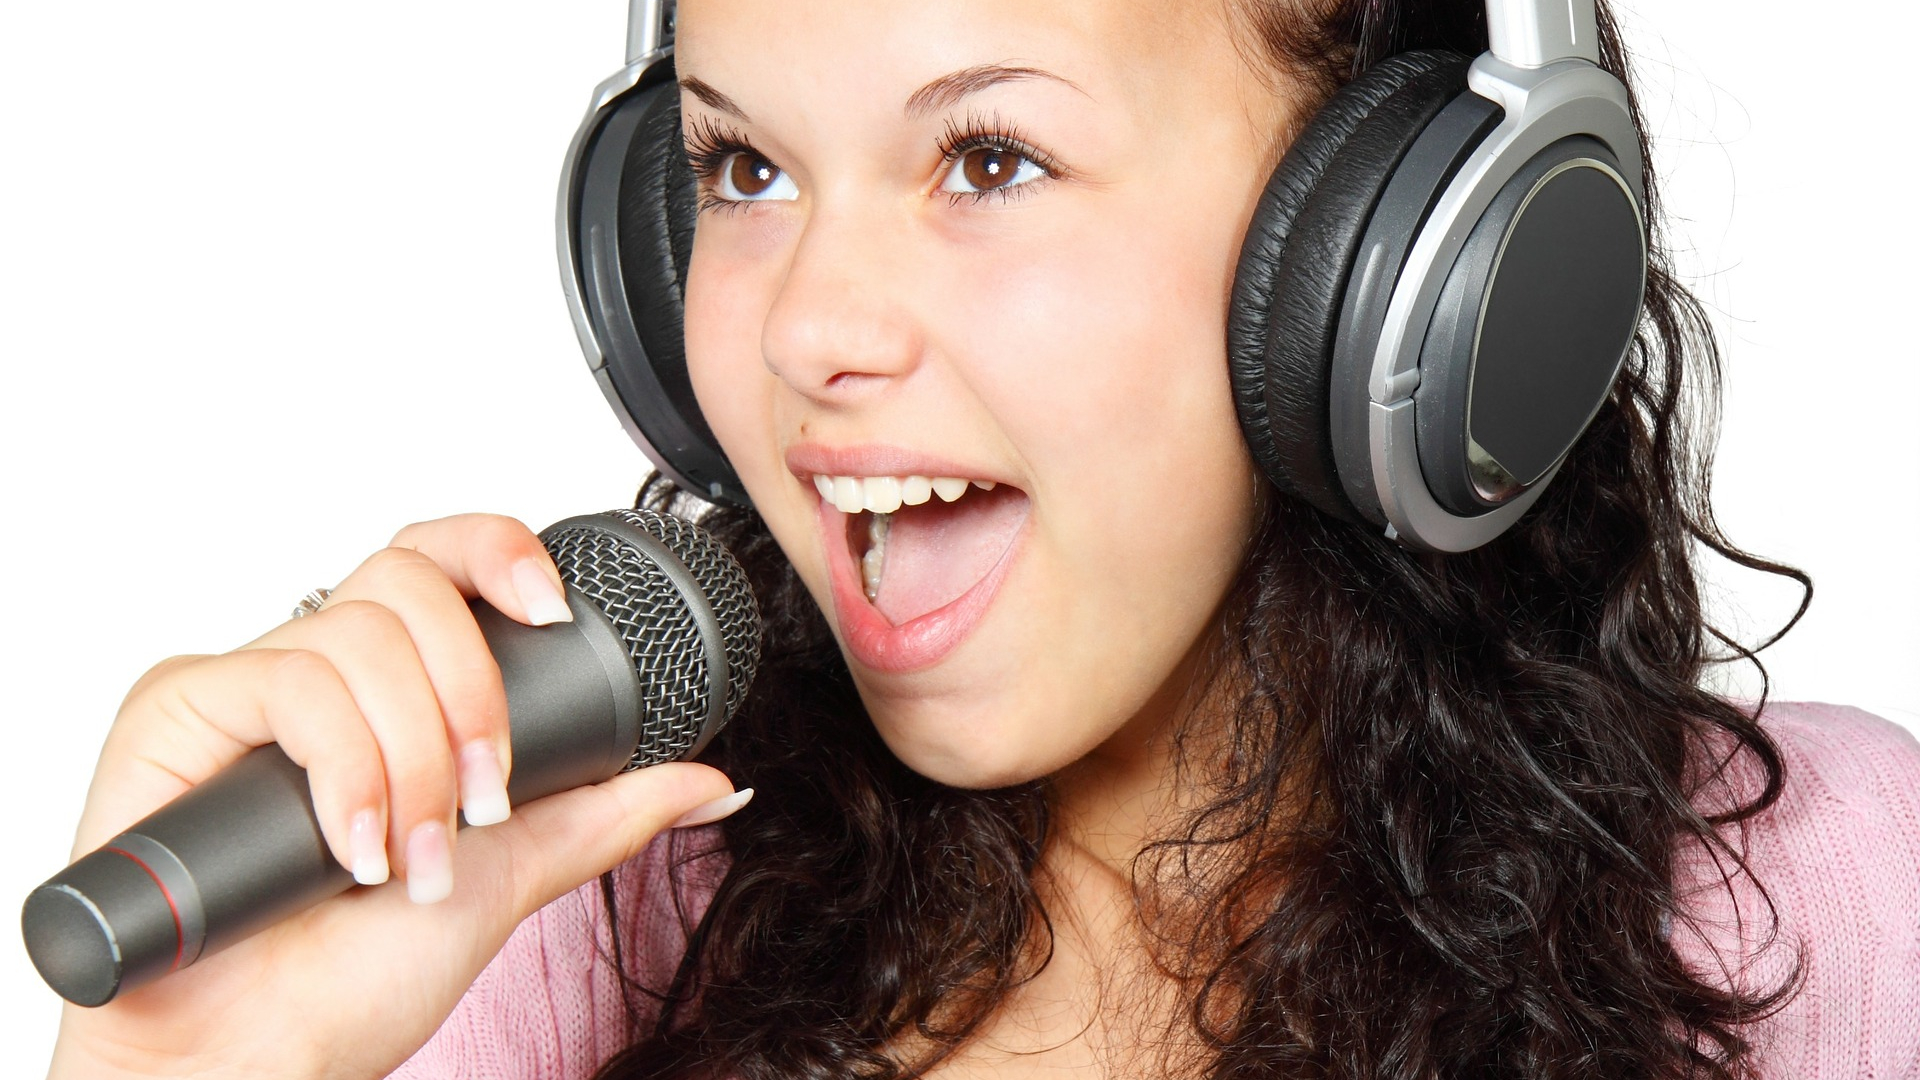 How to make karaoke tracks with Audacity | TechRadar